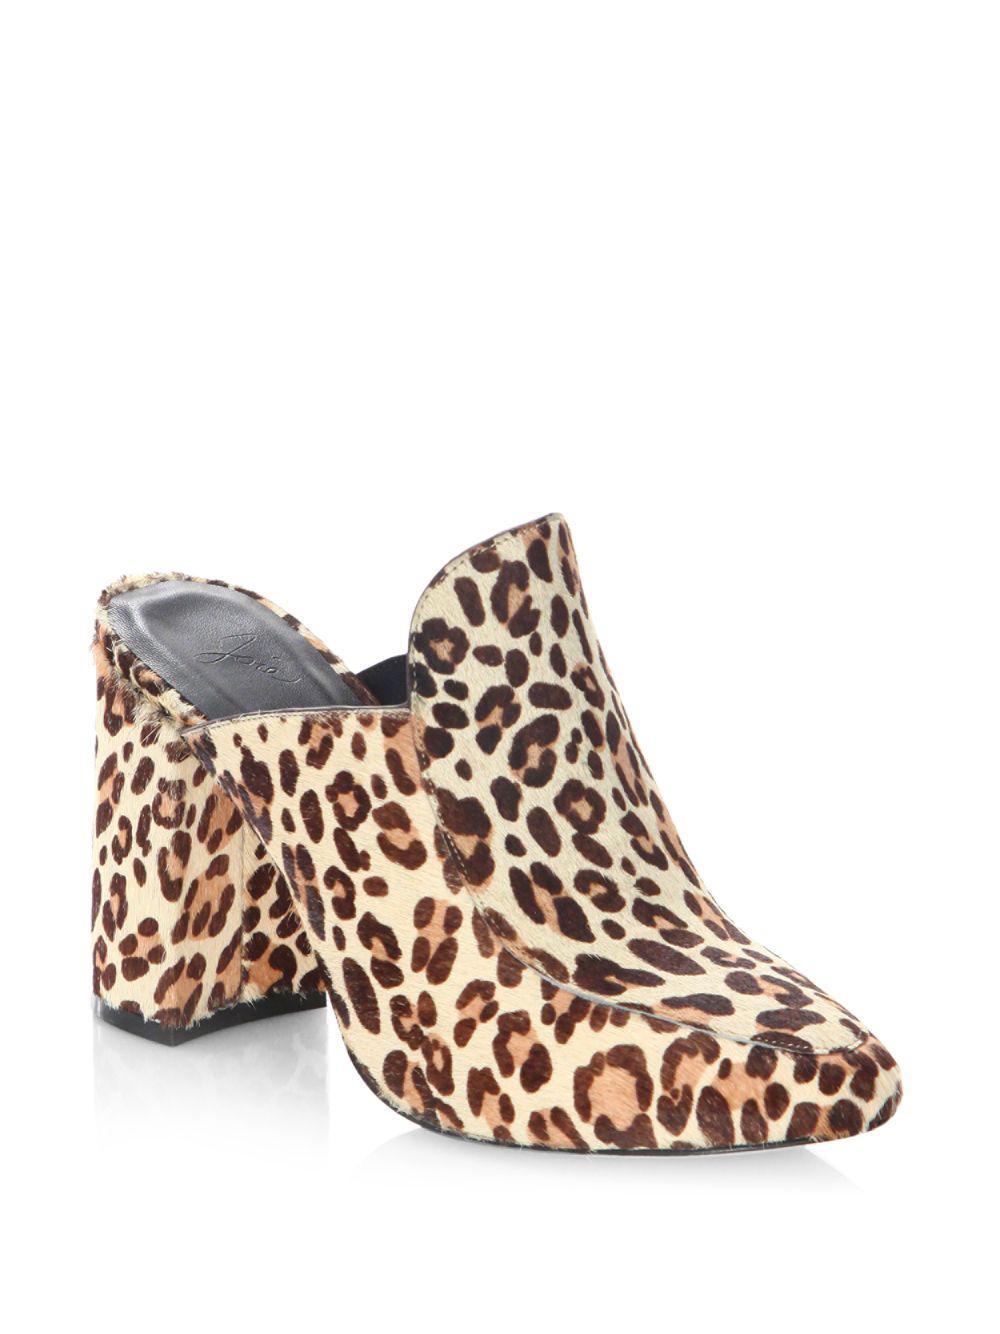 Joie Landri Leopard-Print Mules UY6rqm5Sc